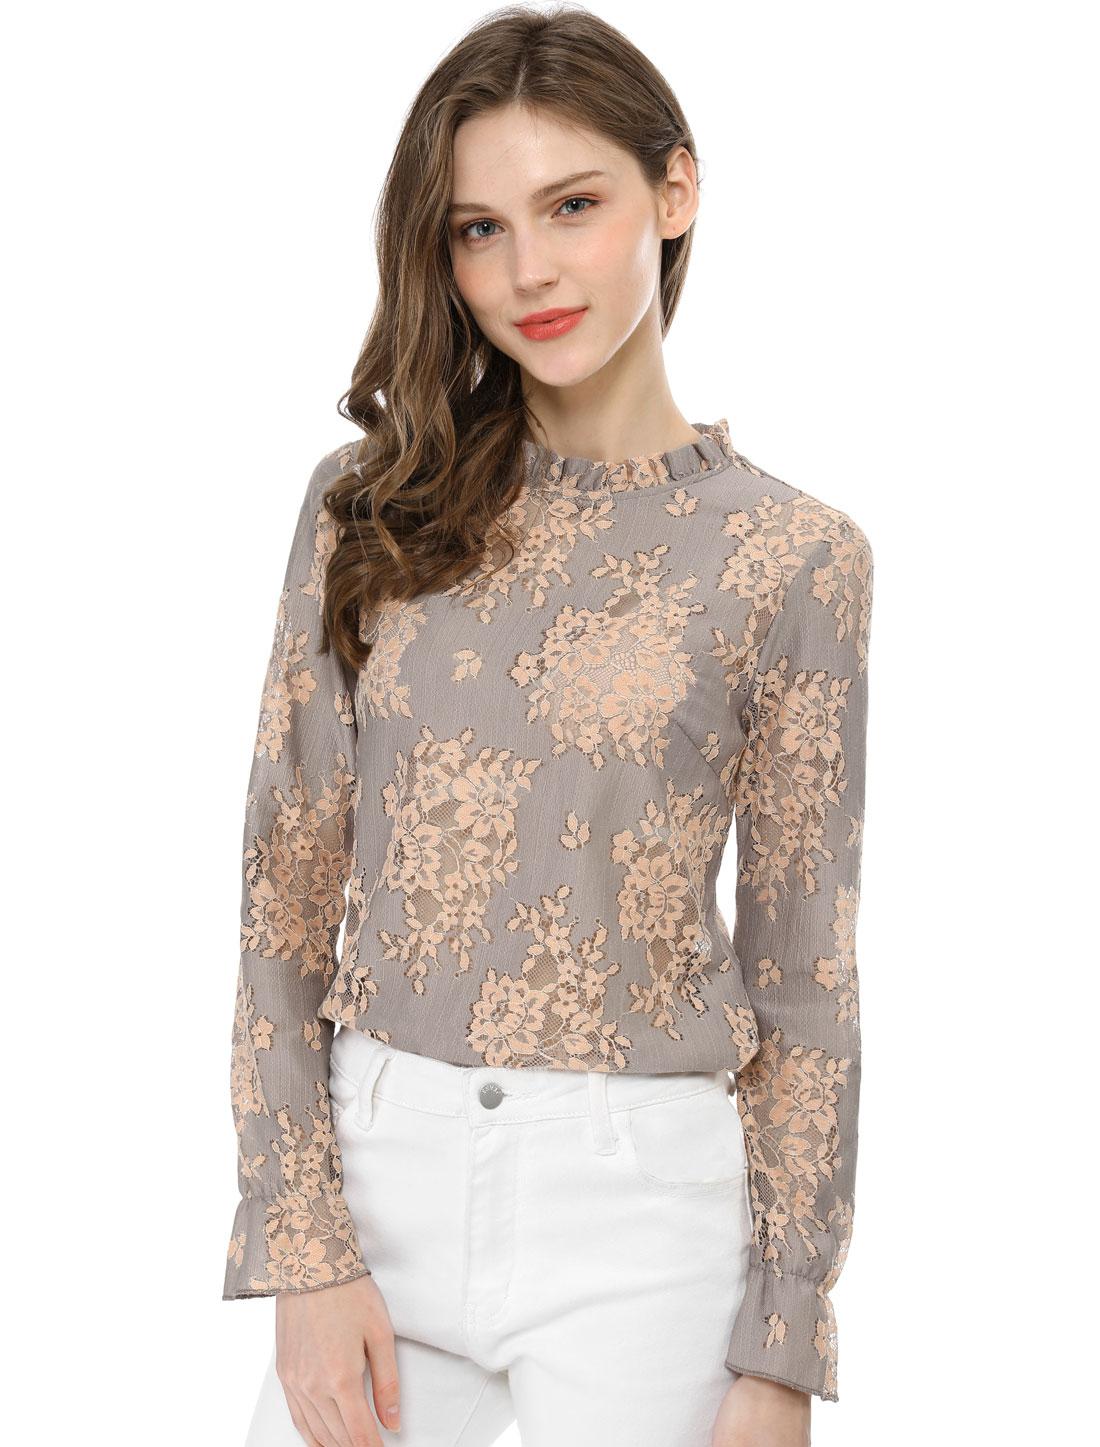 Allegra K Womens Lace Sheer Floral Color Block Blouse Purple S (US 6)